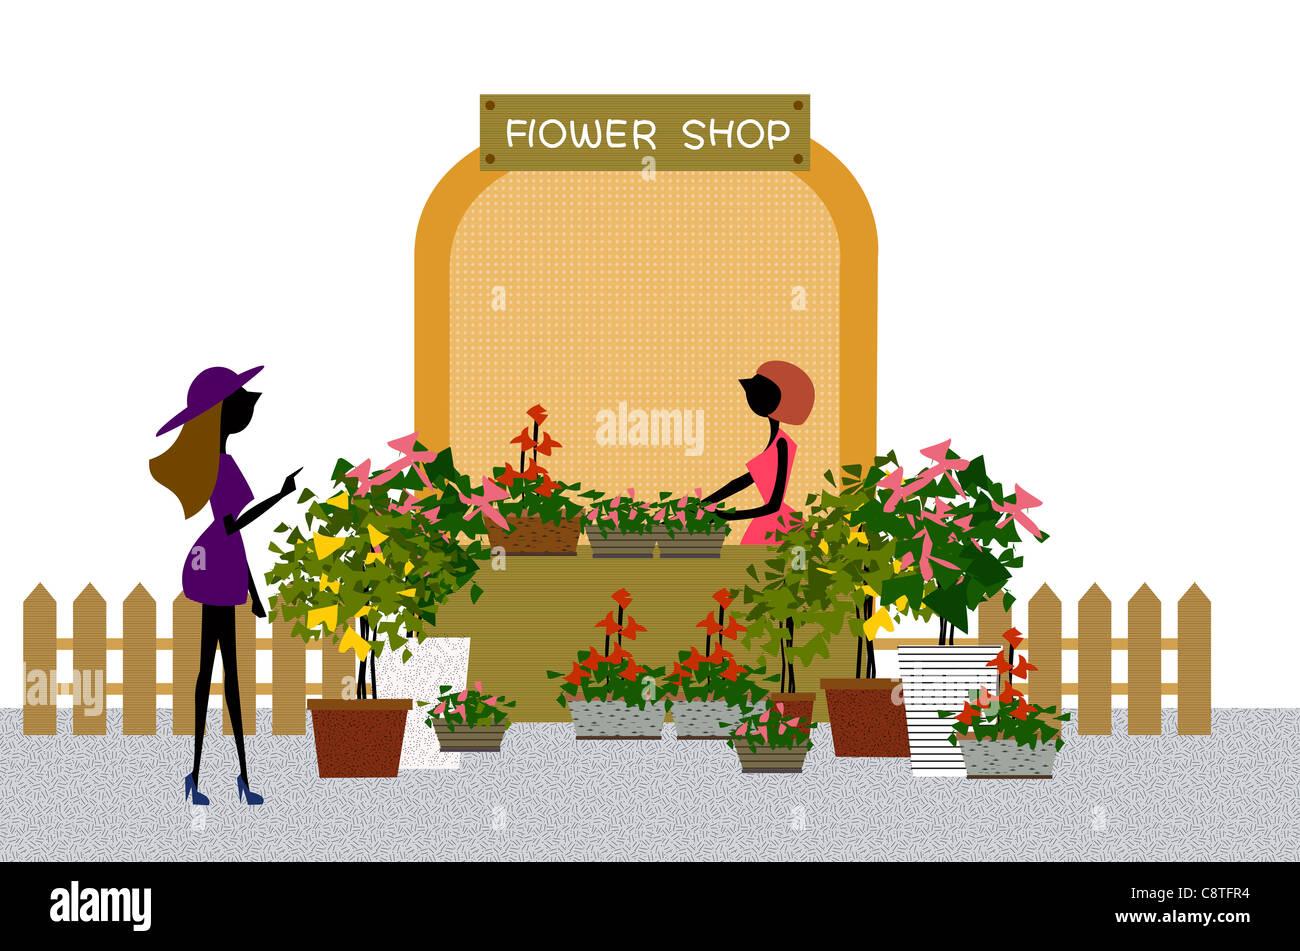 Female At Florist Shop Display - Stock Image